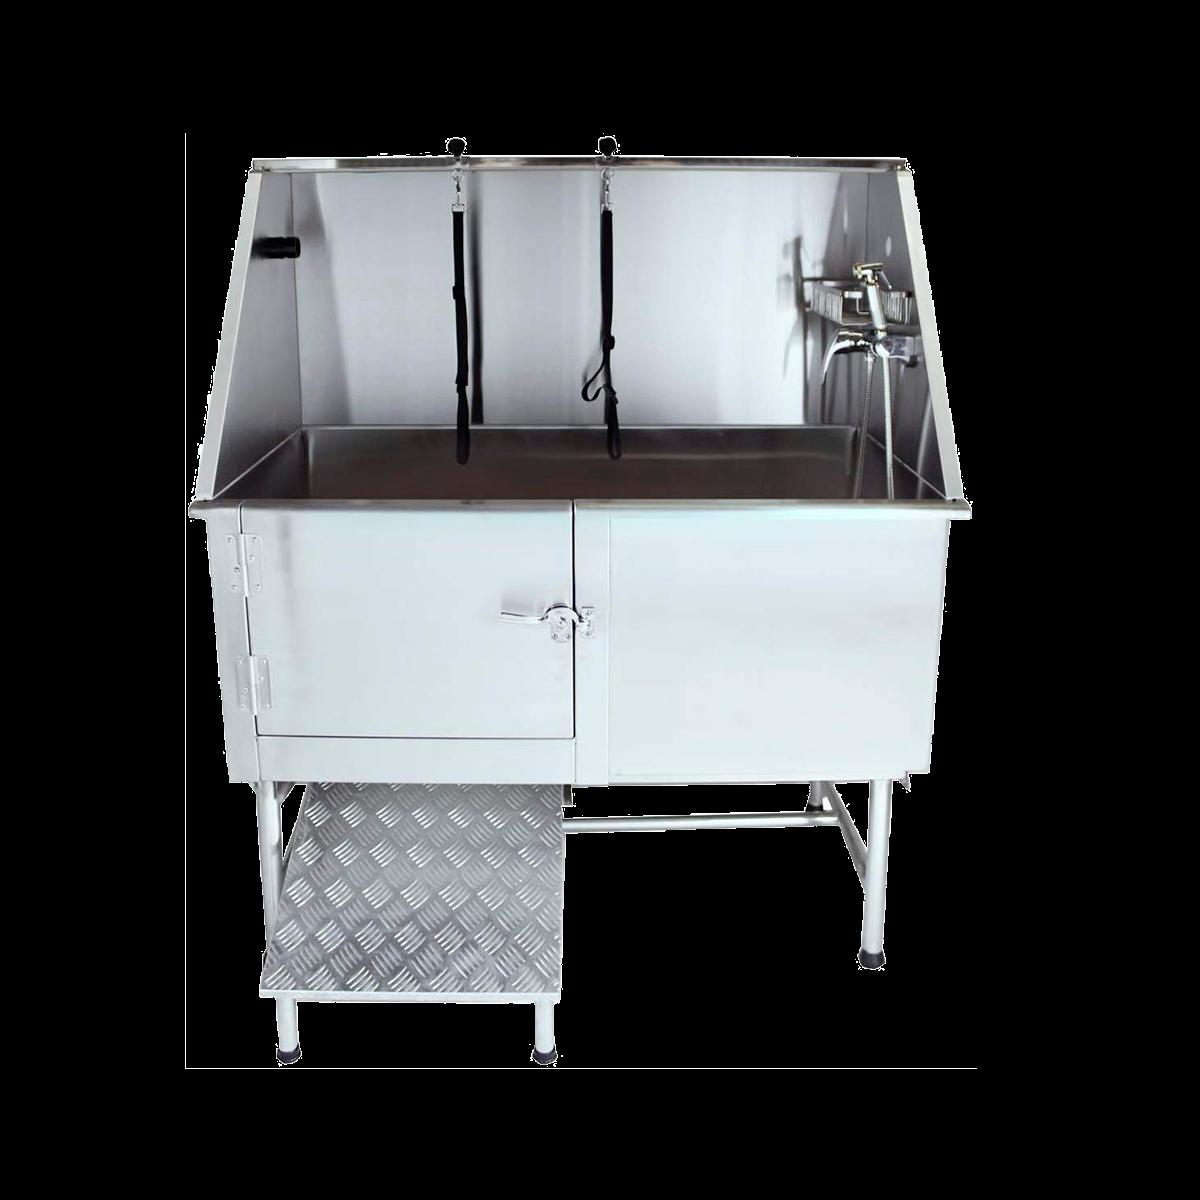 Grooming bath tub